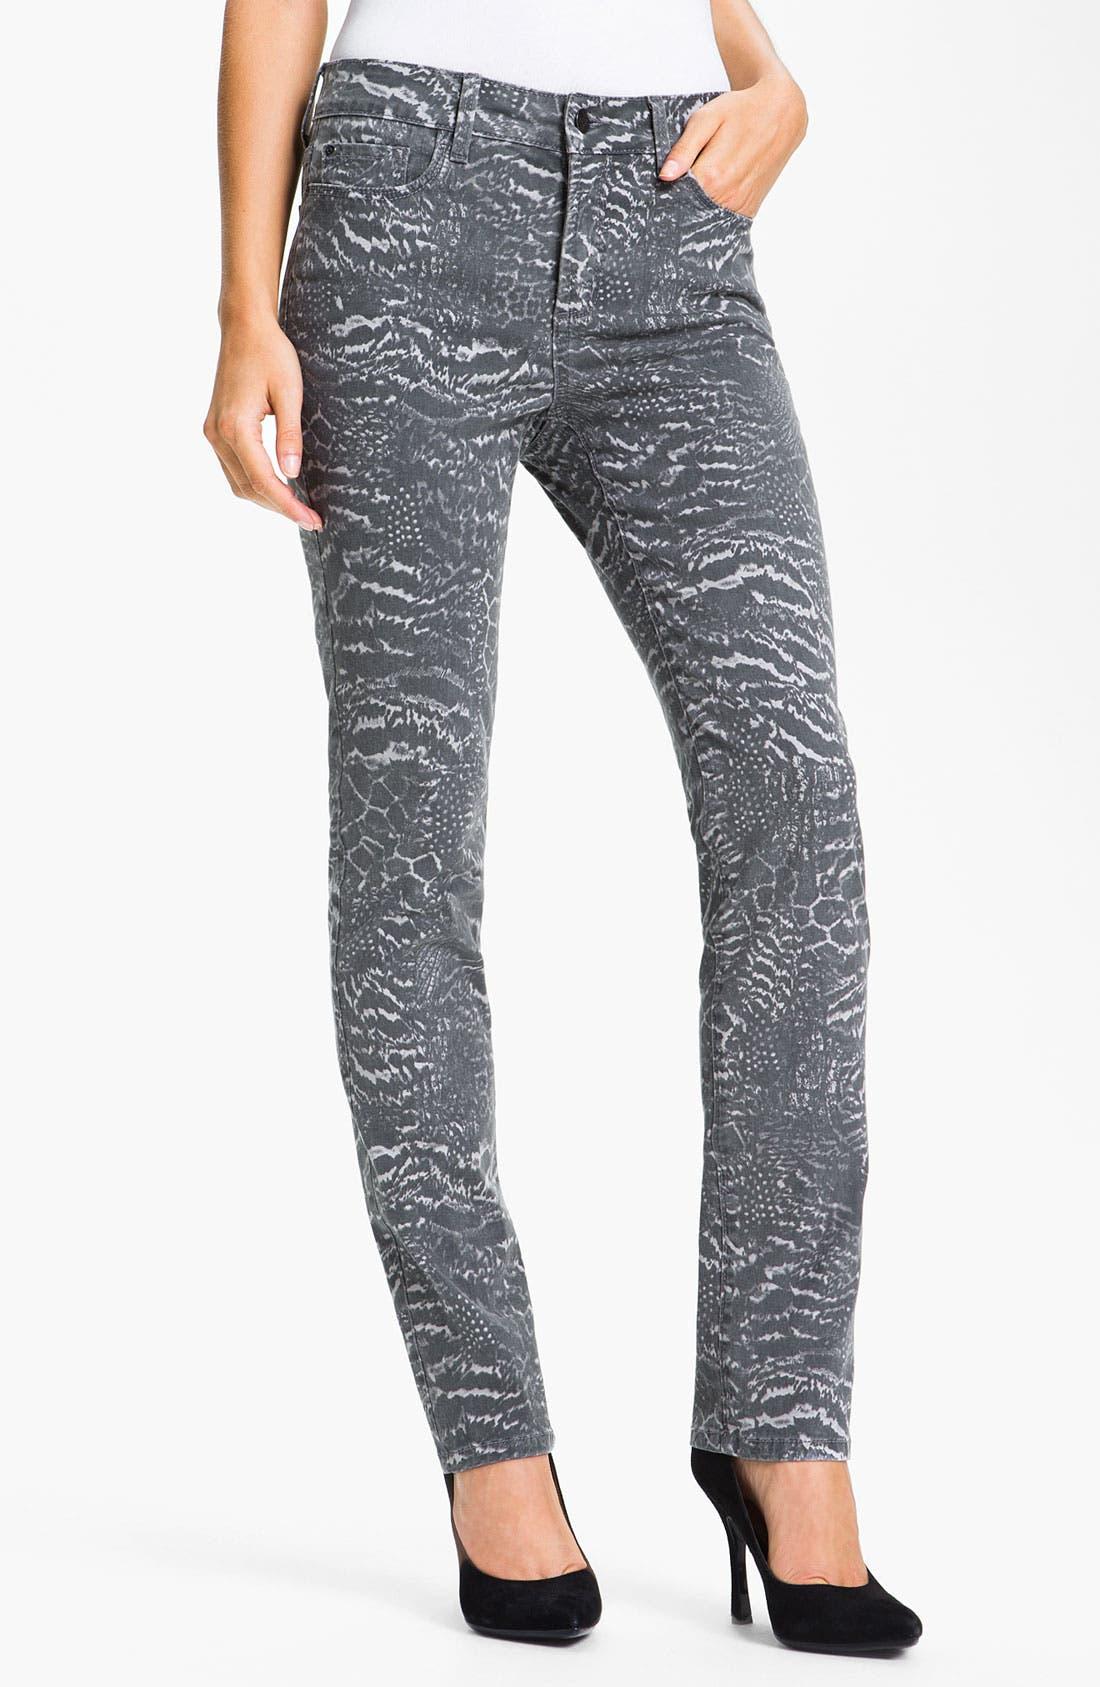 Alternate Image 1 Selected - NYDJ 'Sheri - Nature Collage' Print Skinny Twill Jeans